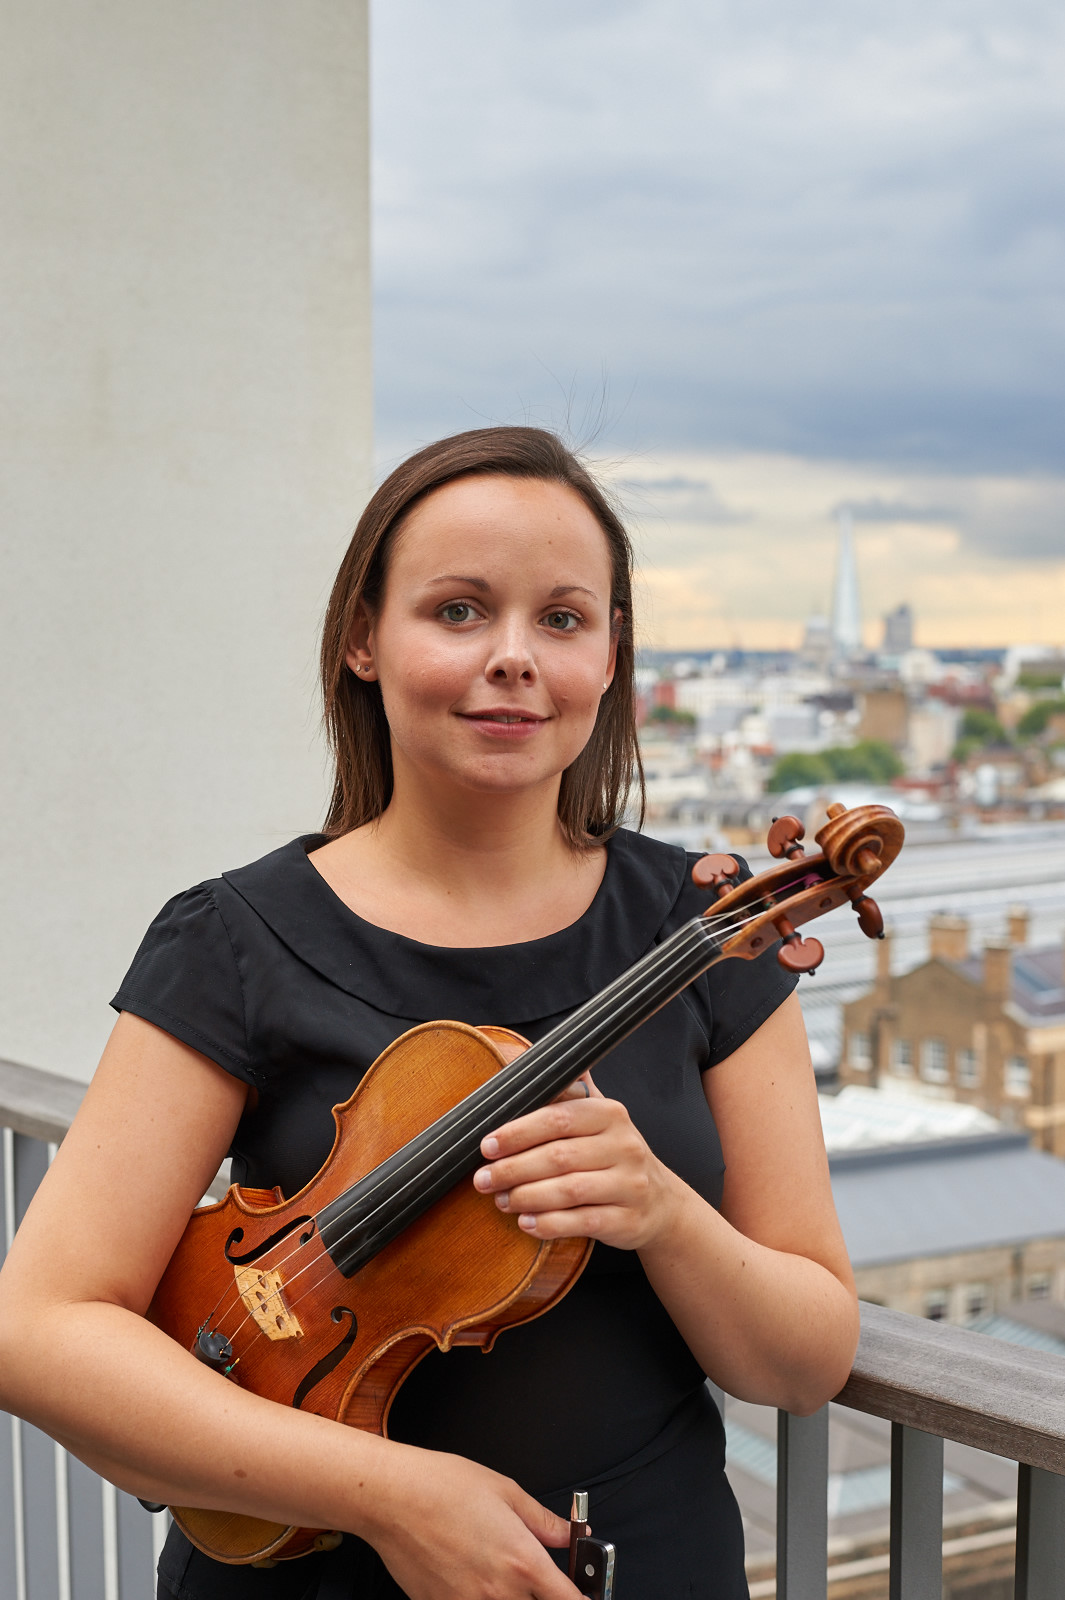 Sophie Mather (photo: Nigel Luckhurst)